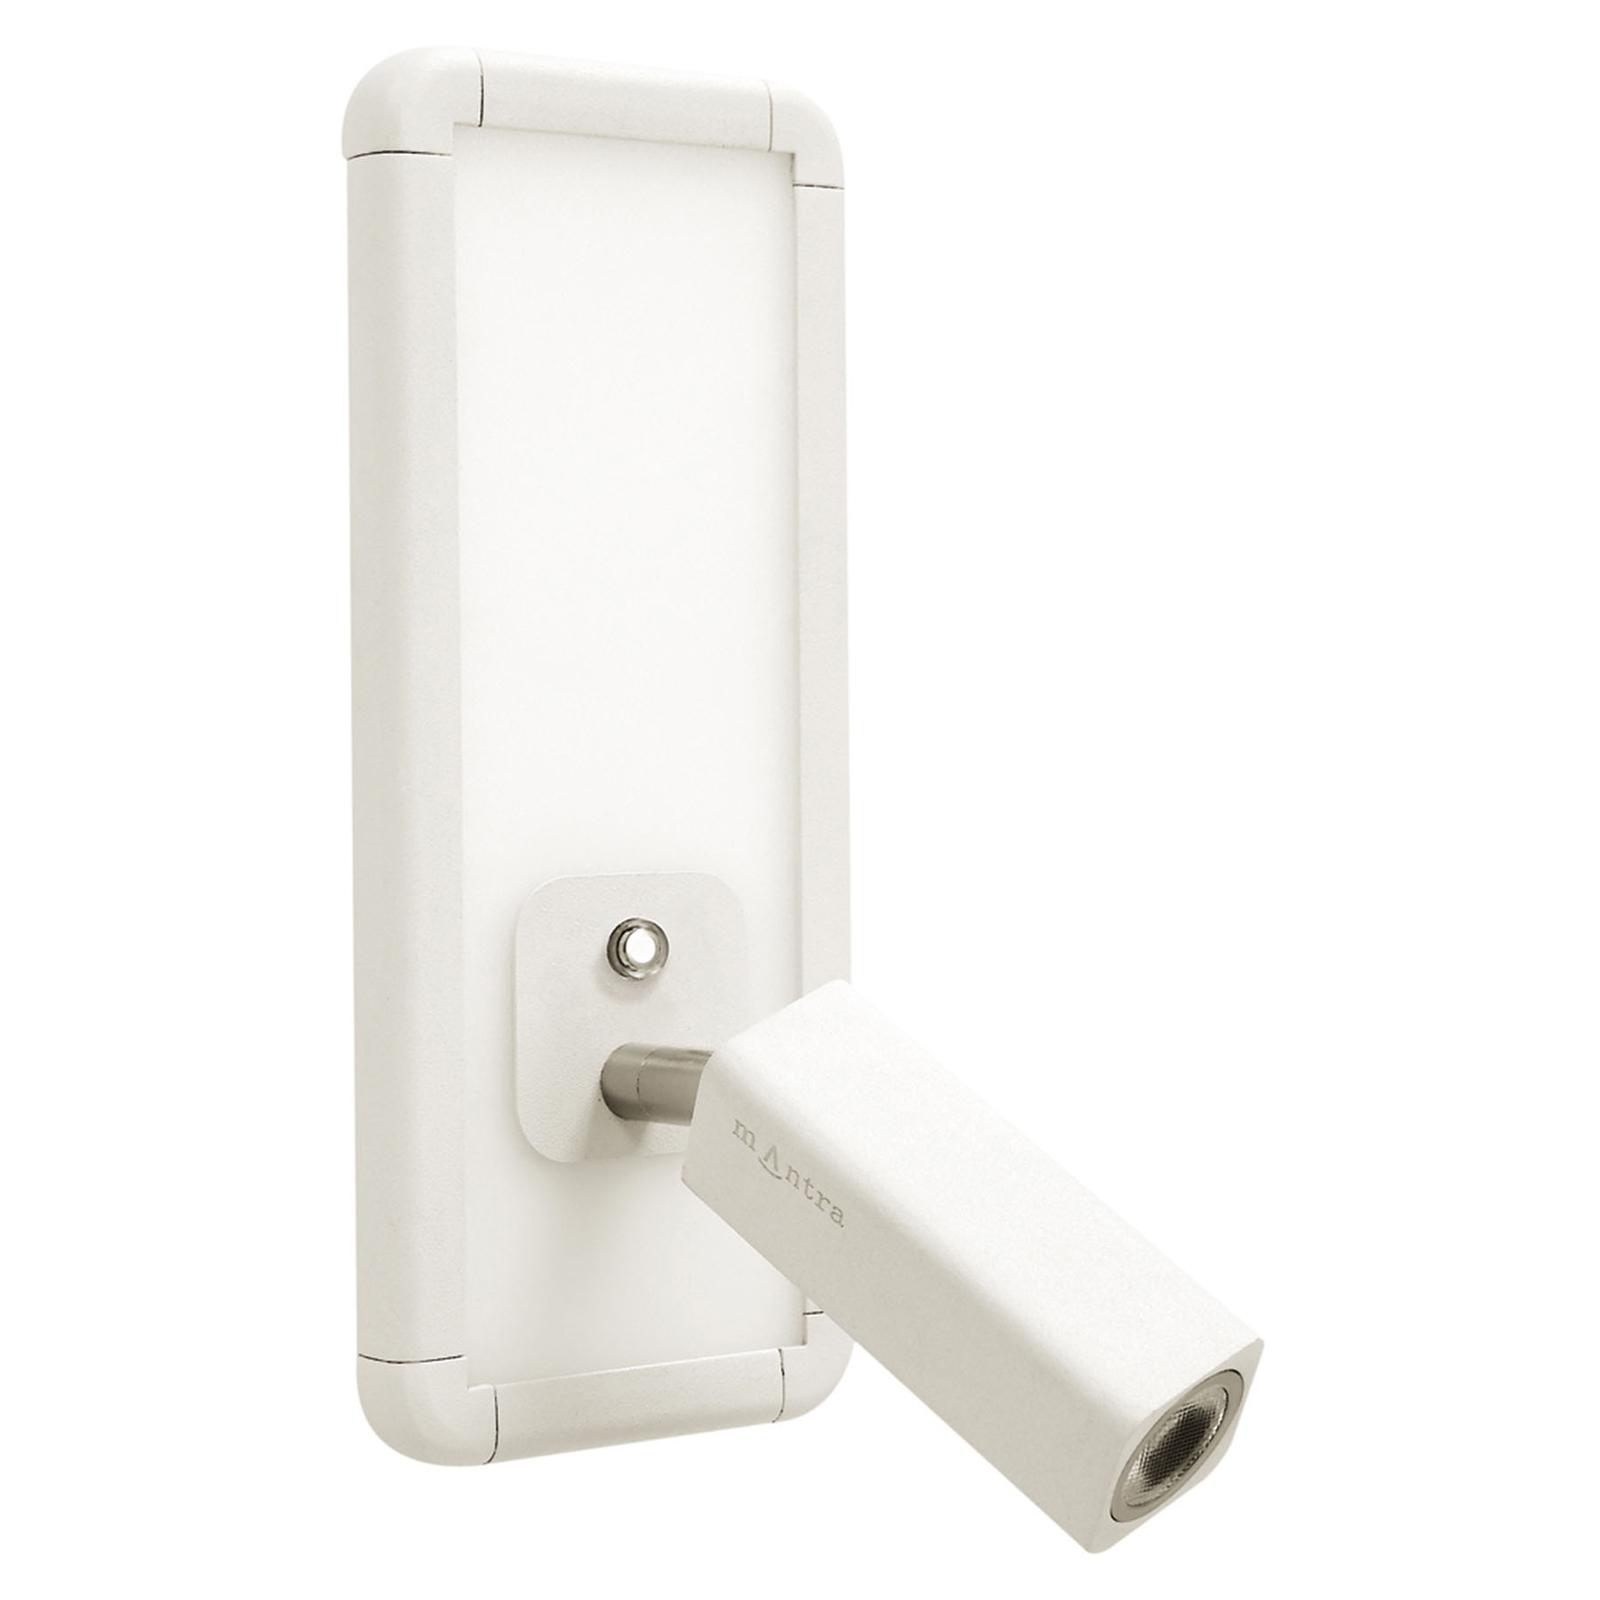 LED wandlamp Ibiza met leesarm, wit